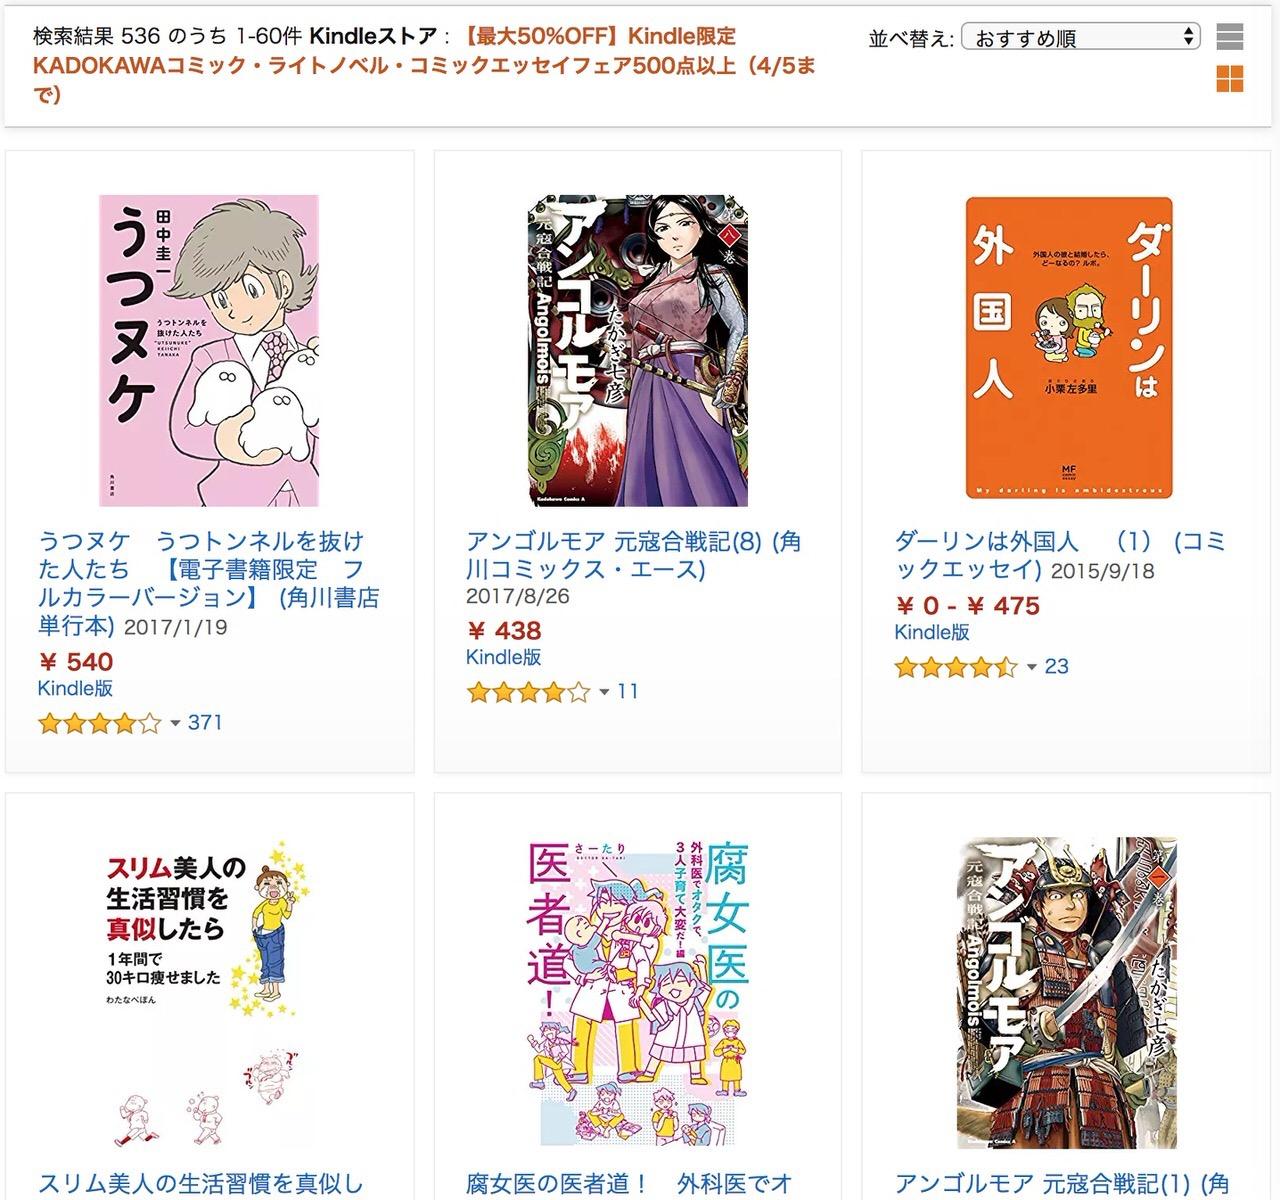 【Kindleセール】最大50%OFF「Kindle限定 KADOKAWAコミック・ライトノベル・コミックエッセイフェア」(4/5まで)